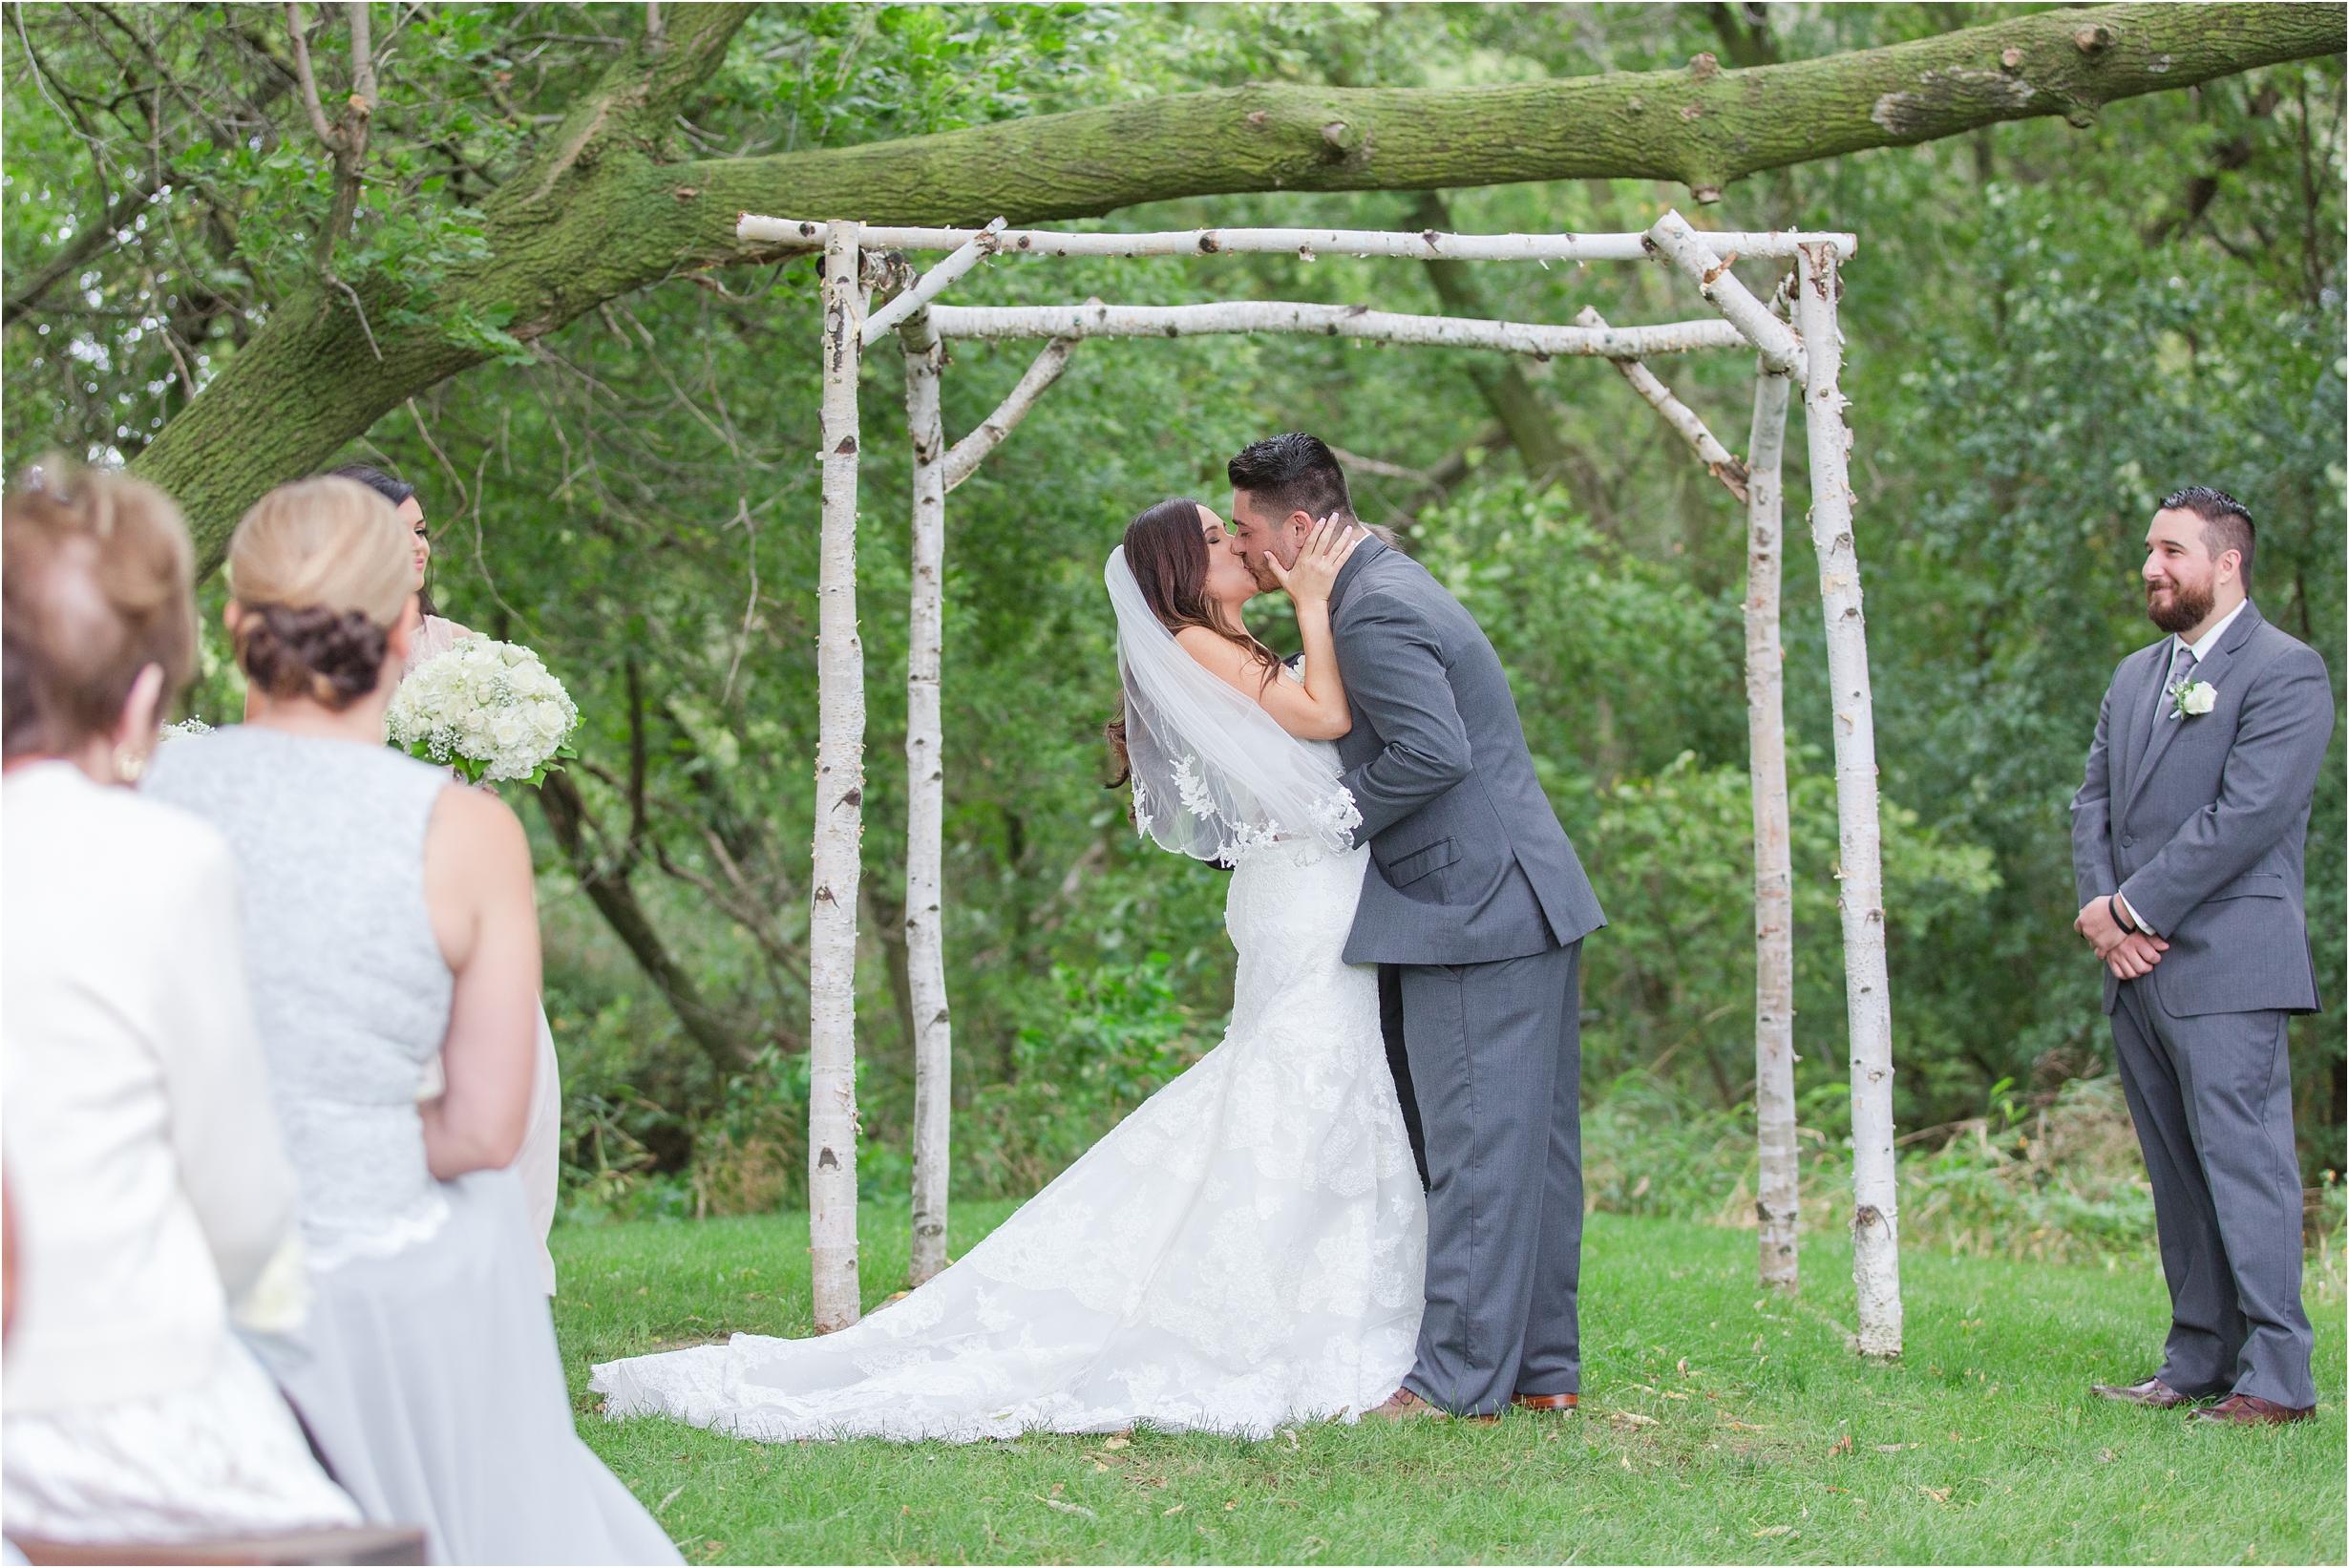 romantic-timeless-candid-wedding-photos-at-the-valley-frutig-farms-in-ann-arbor-mi-by-courtney-carolyn-photography_0005.jpg